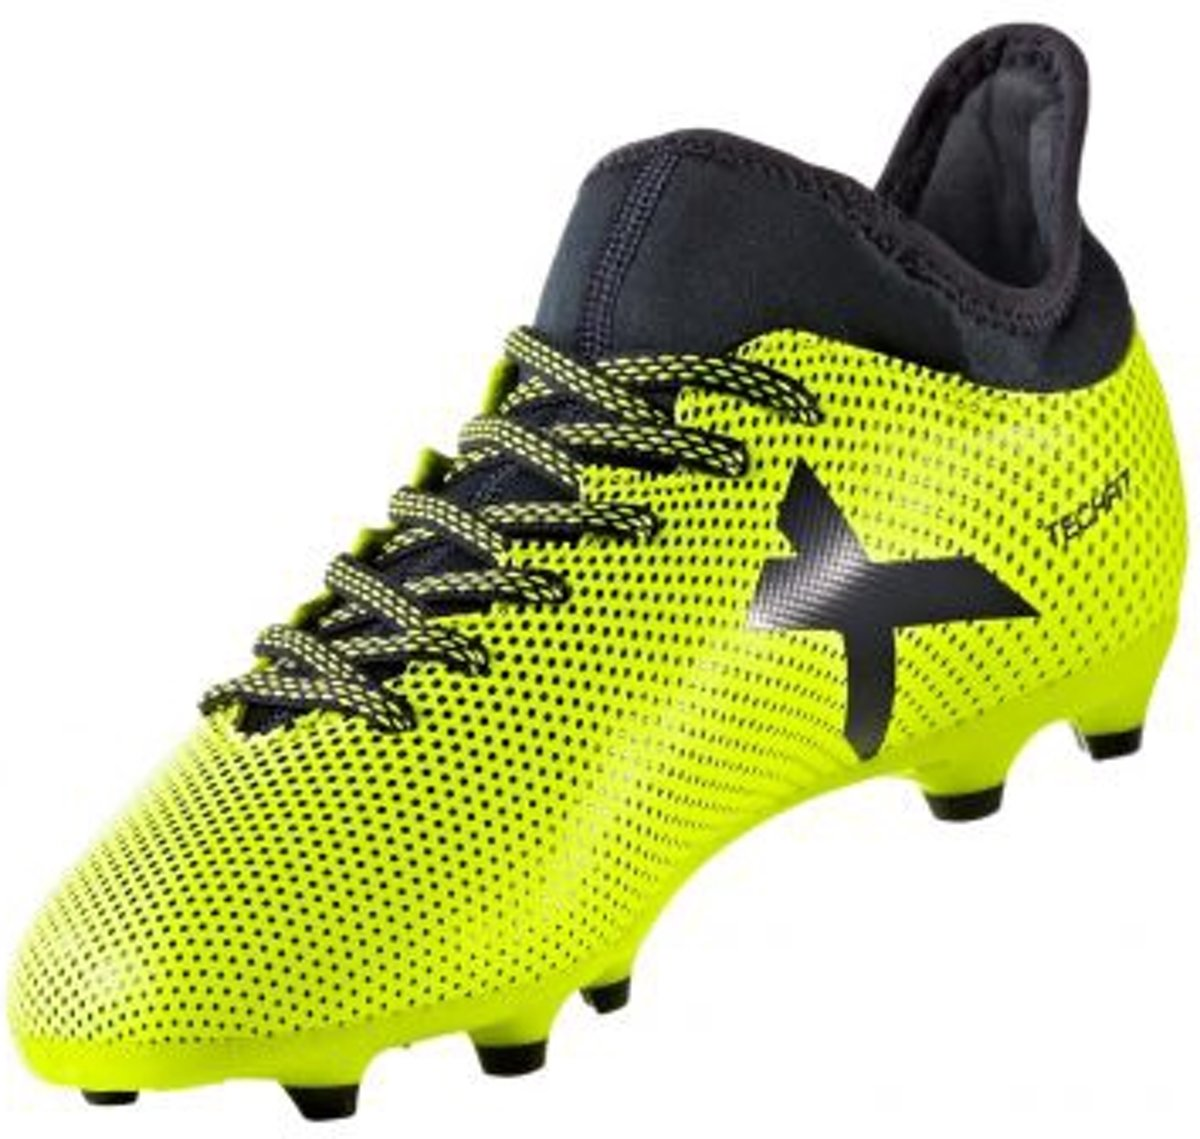 Adidas - X17.3 Soccer Fg - Unisexe - Football - Jaune - 45 1/3 NrEZrY